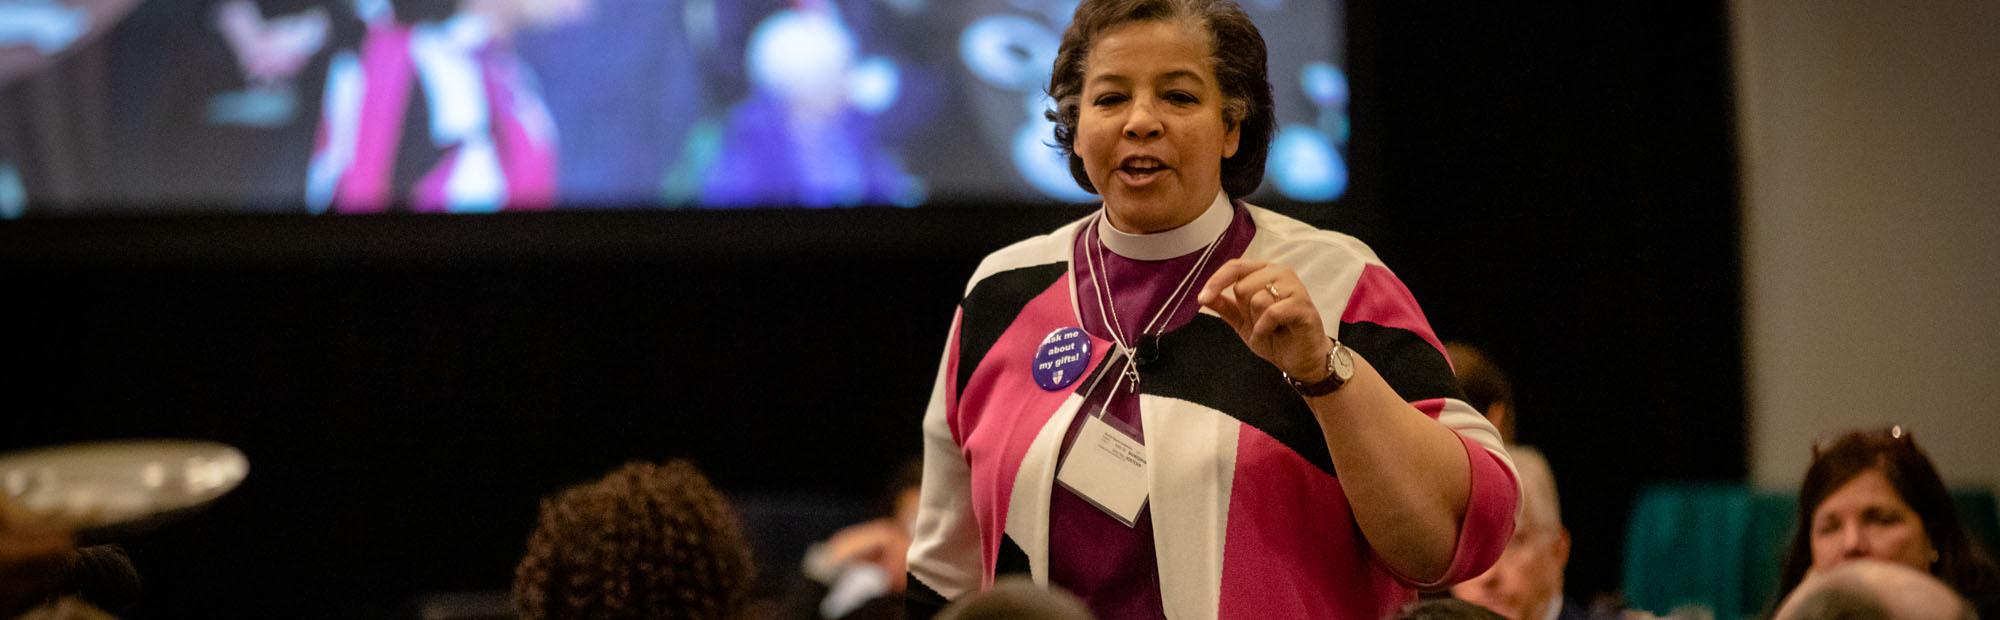 Bishop Carlye Hughes addressing Convention. CYNTHIA L. BLACK PHOTO